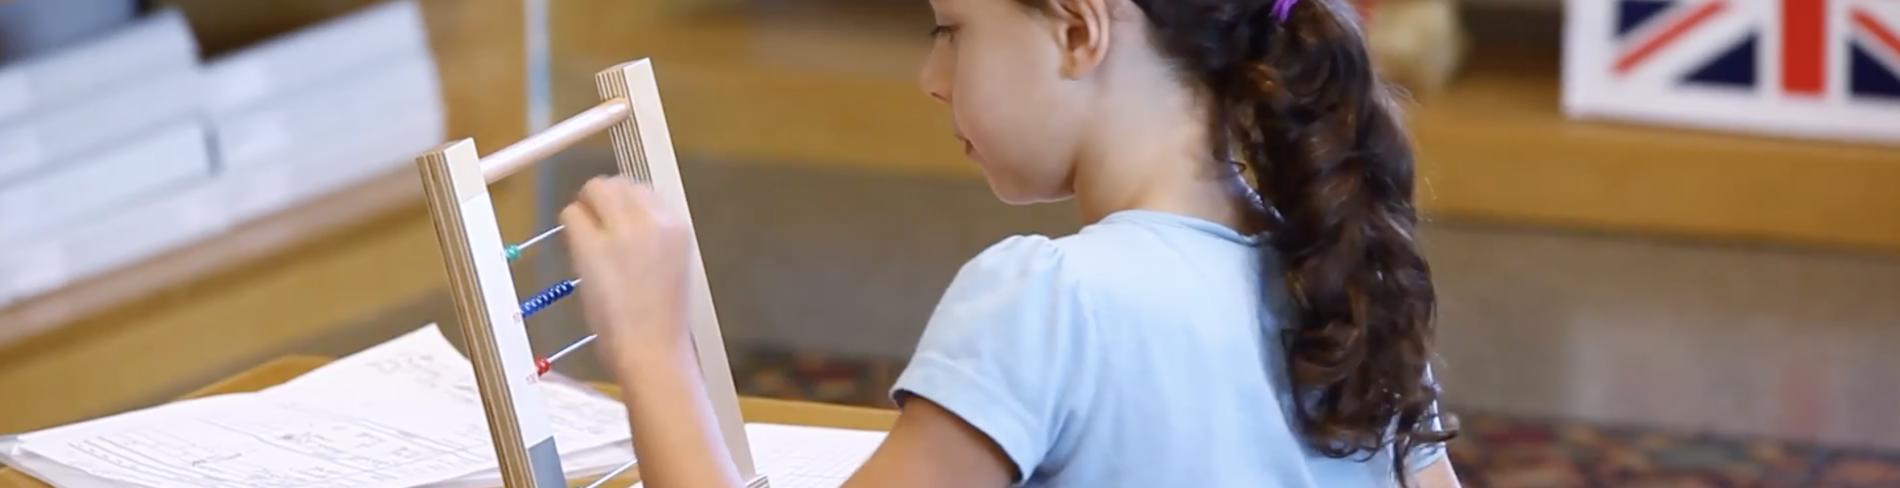 Montessori Elementary School Student